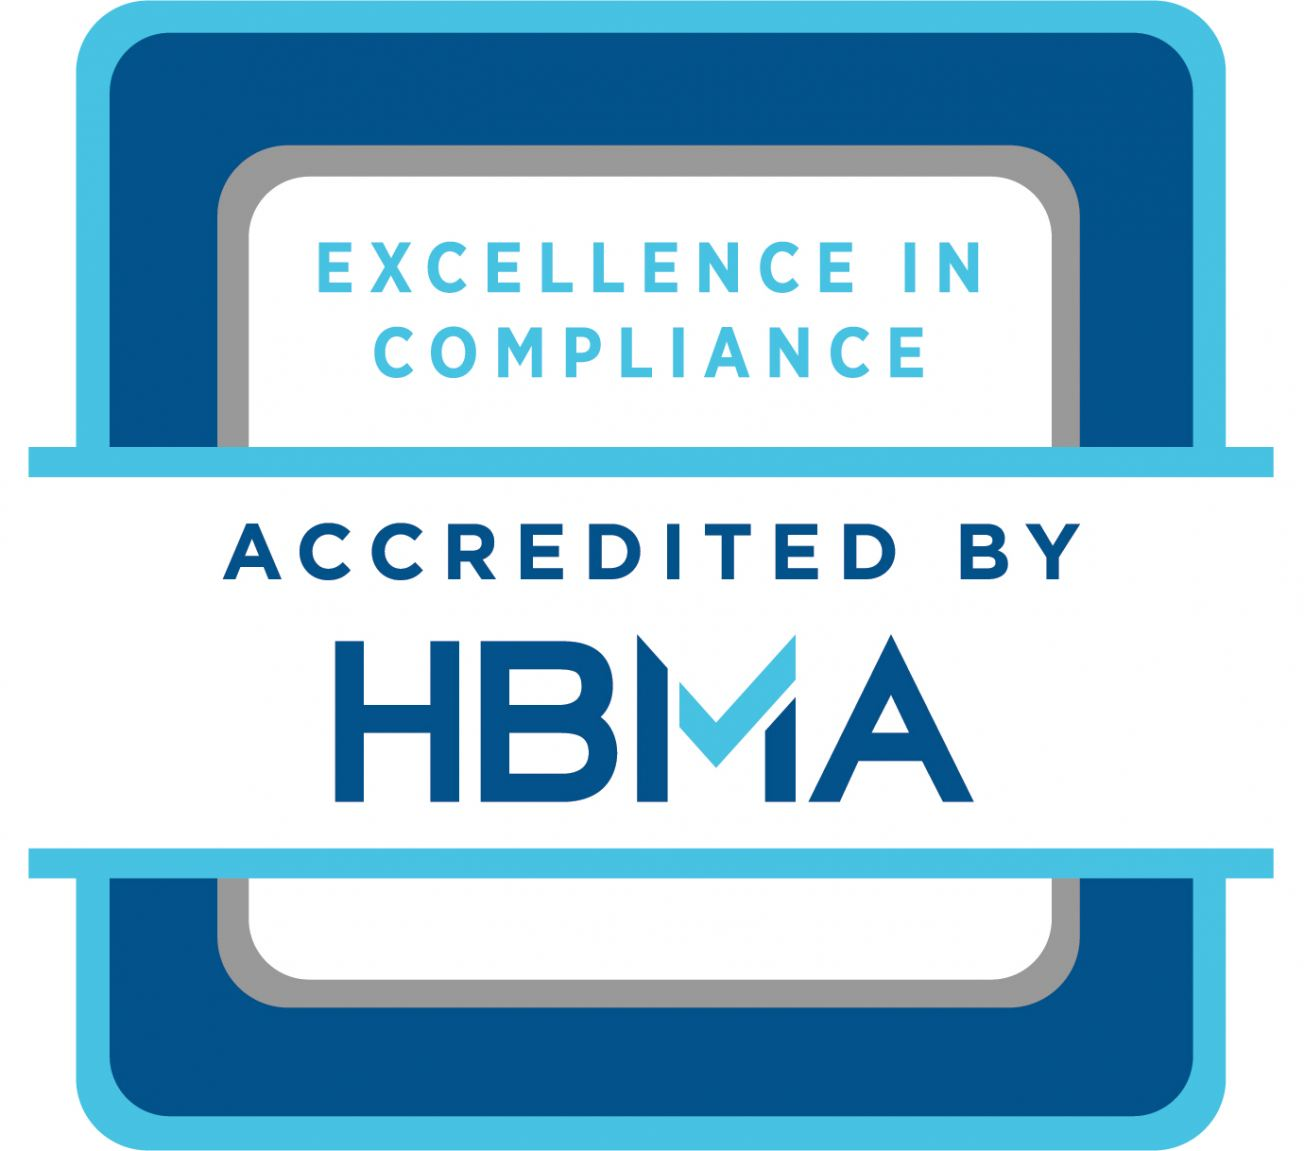 HBMA Compliance Accreditation Program